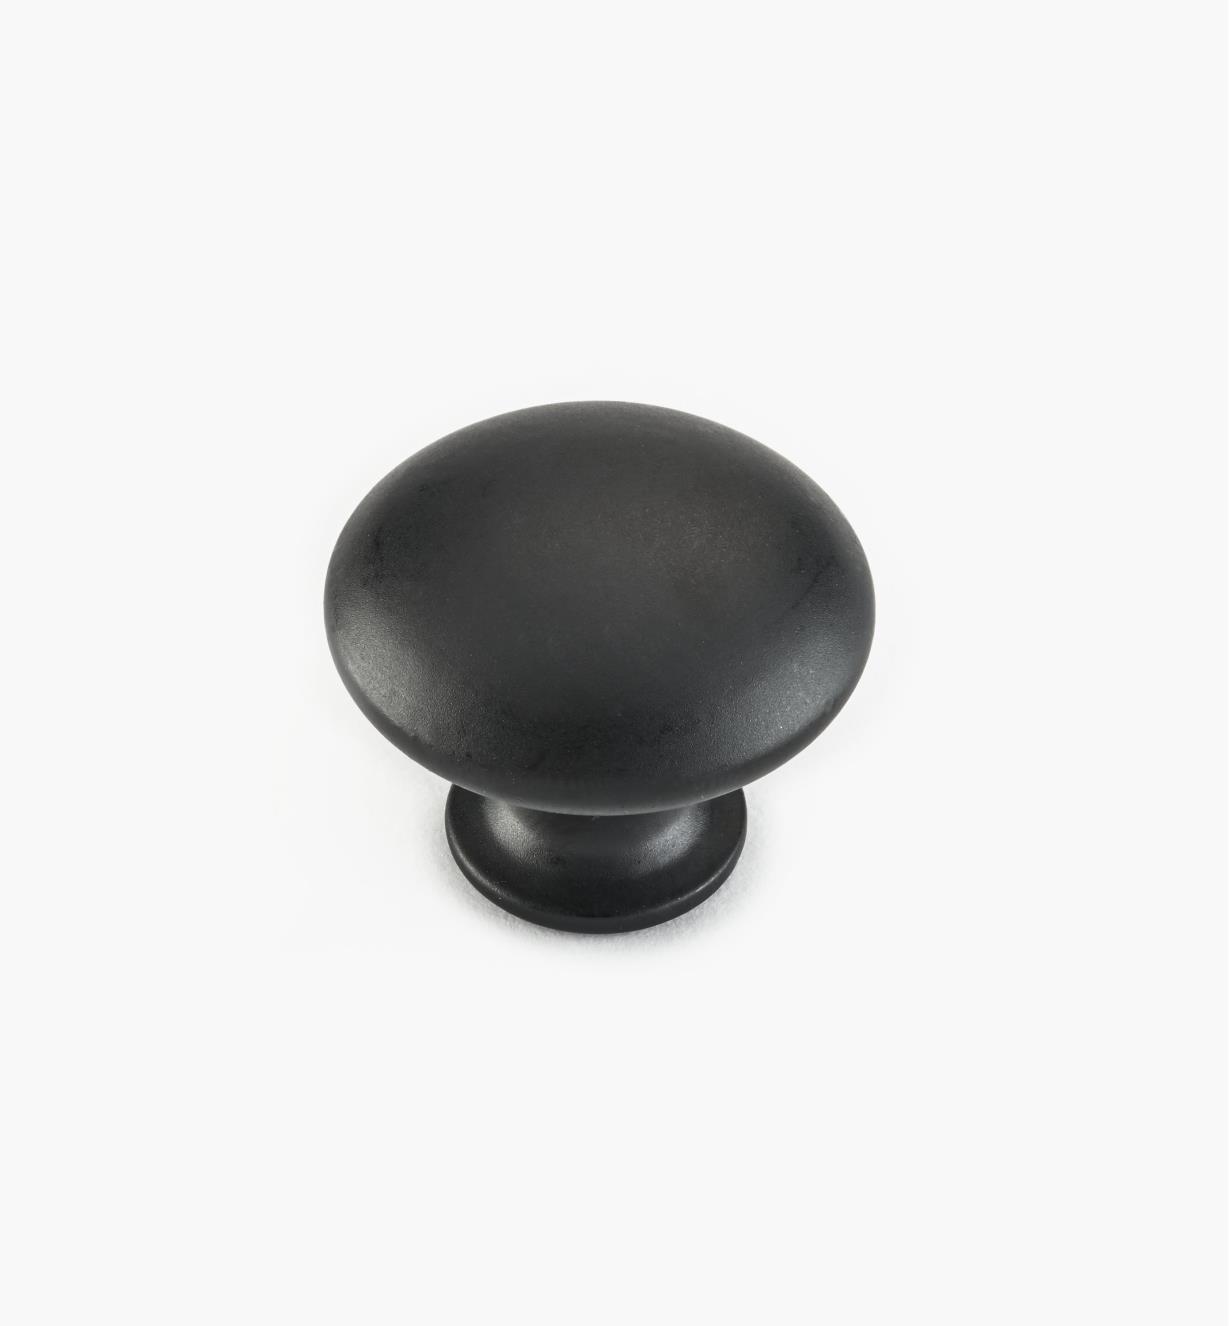 "02W4306 - 1 1/8"" x 7/8"" Black Knob"